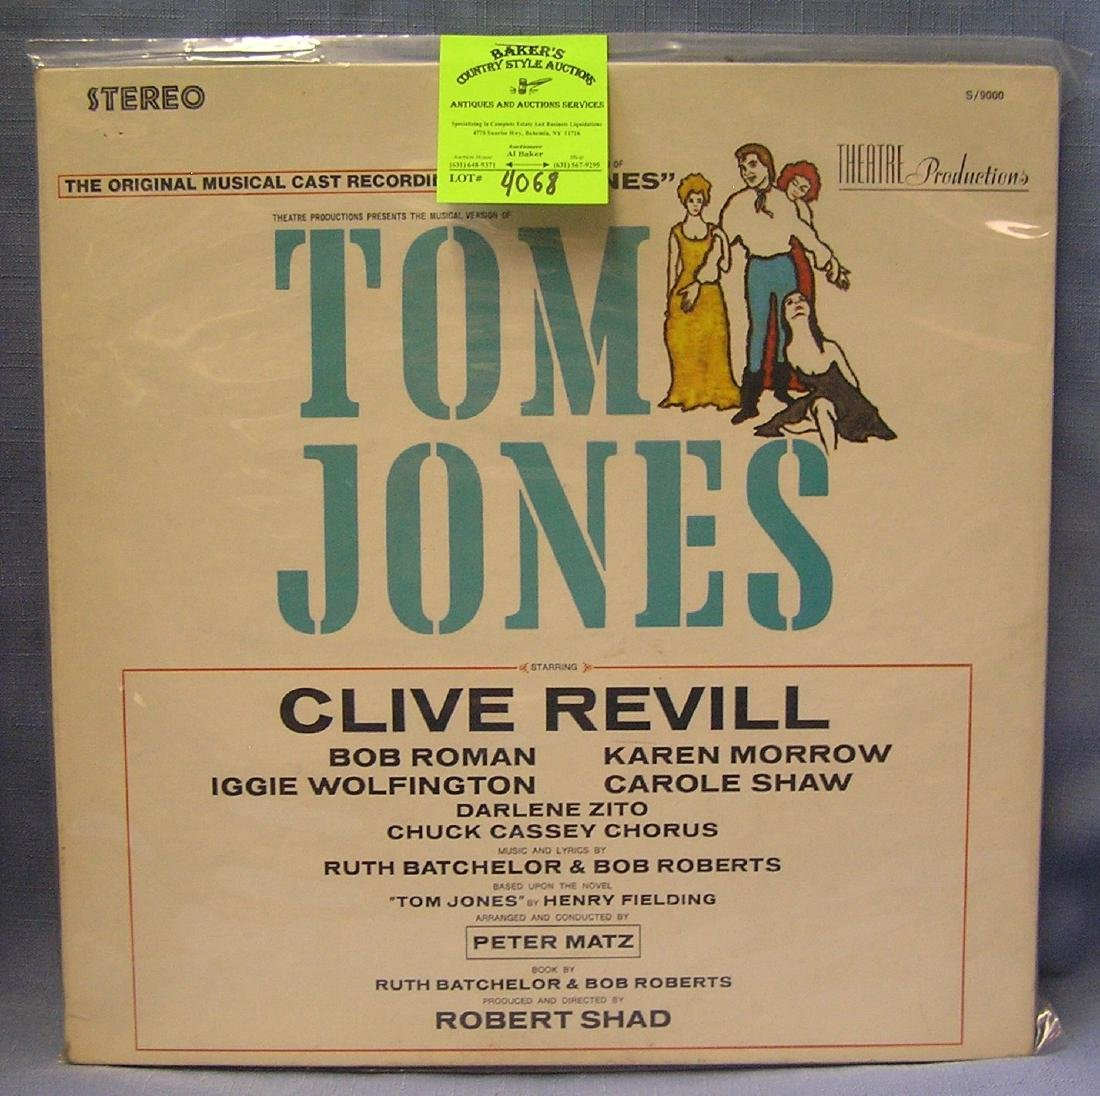 Vintage Tom Jones record album